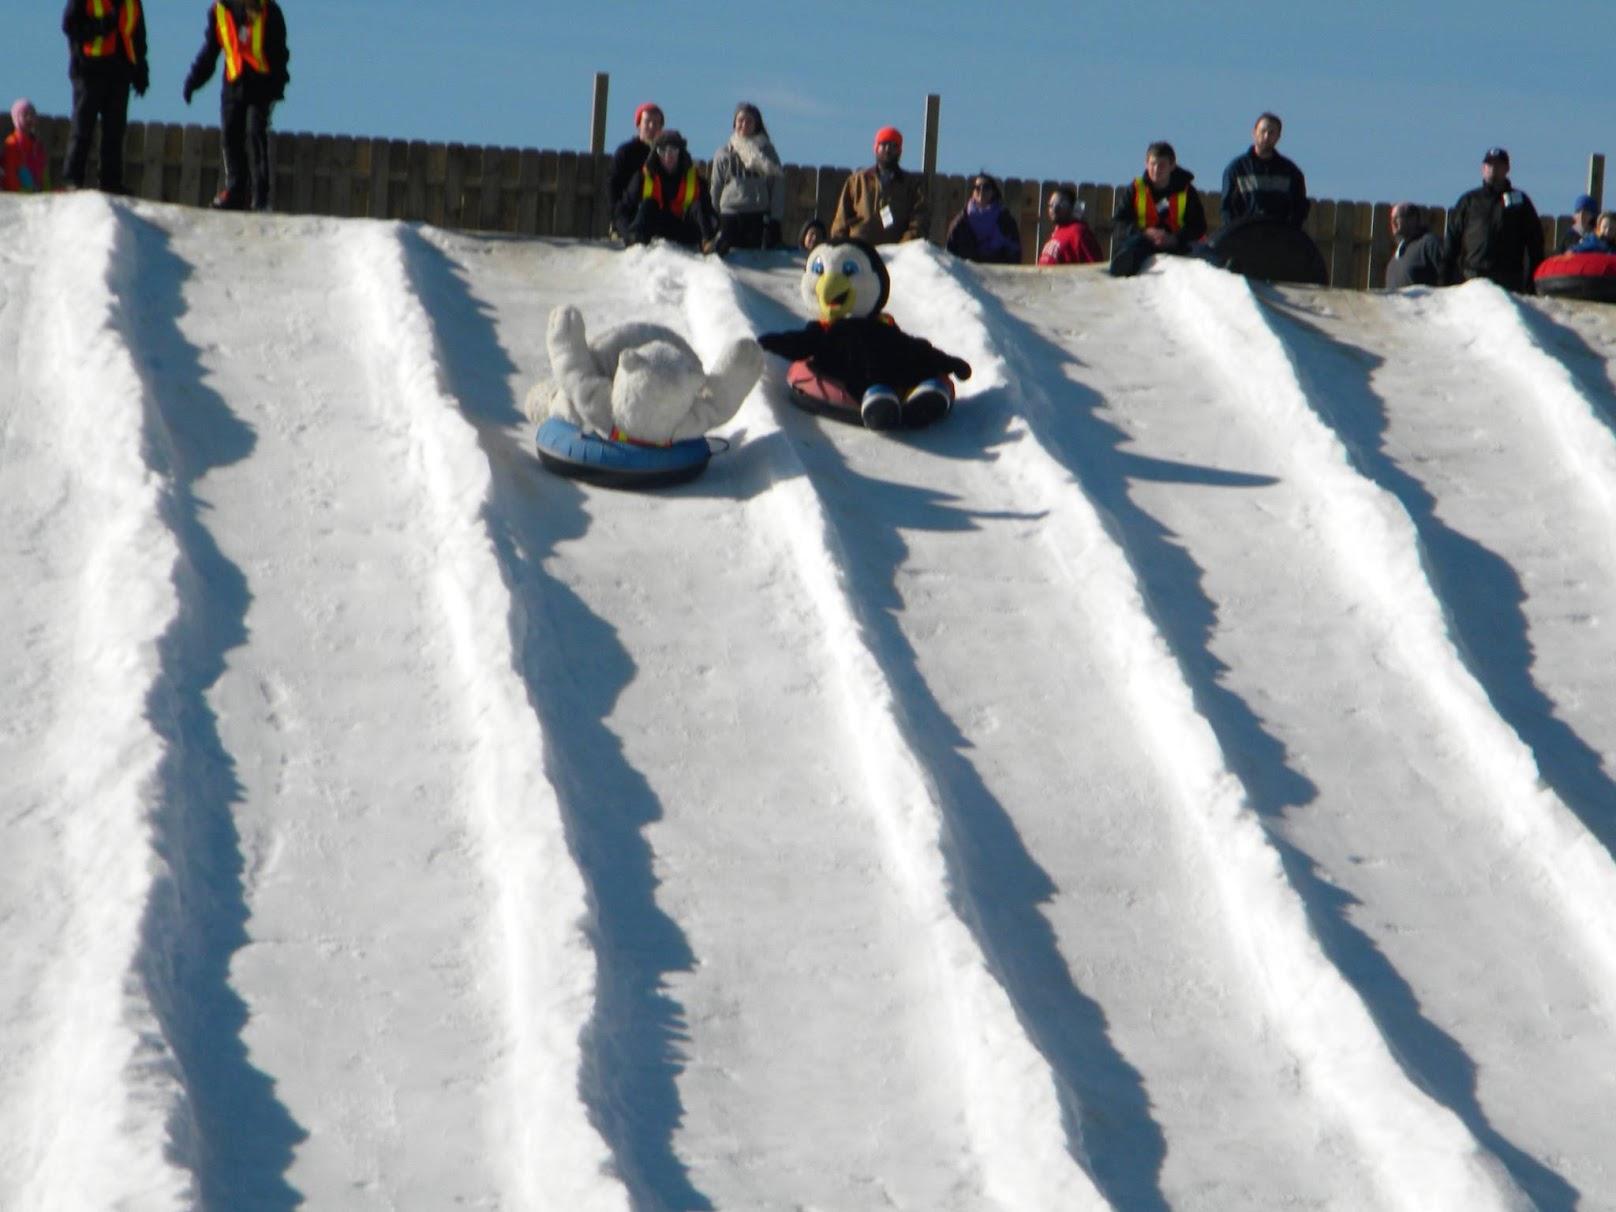 Snow Tubing Fun For The Whole Family At Beach Mountain